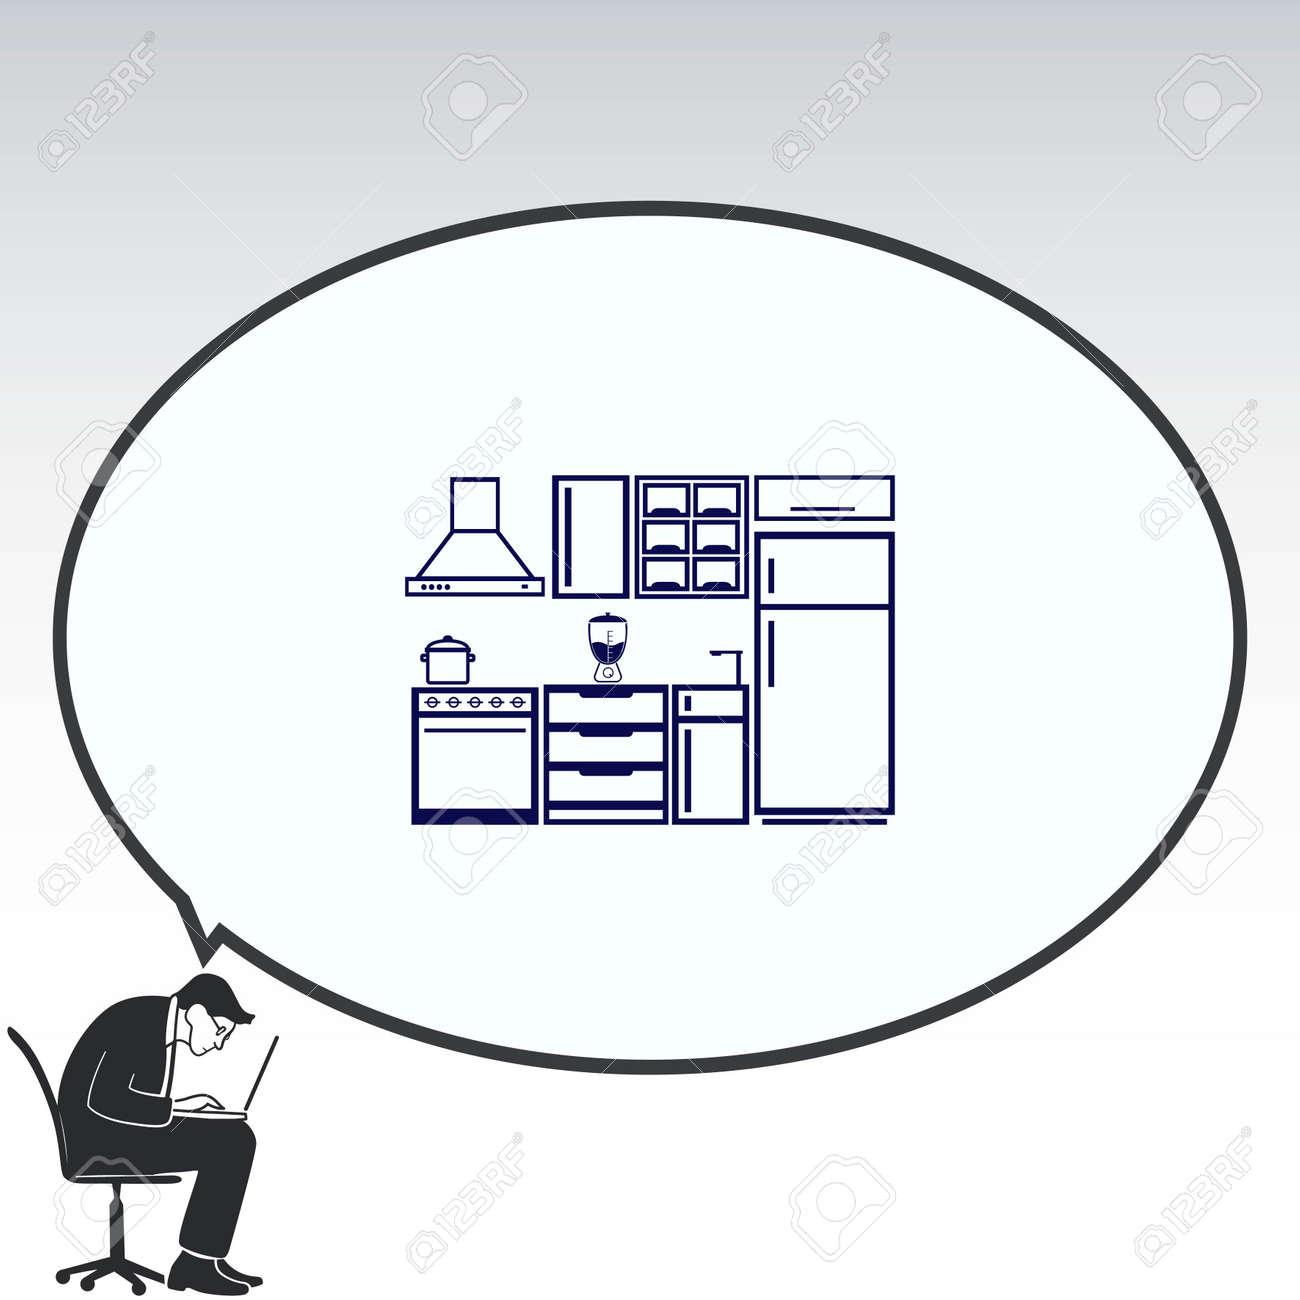 Home Interior Design Icon, Kitchen Icon, Dining Icon, Vector Illustration.  Flat Design